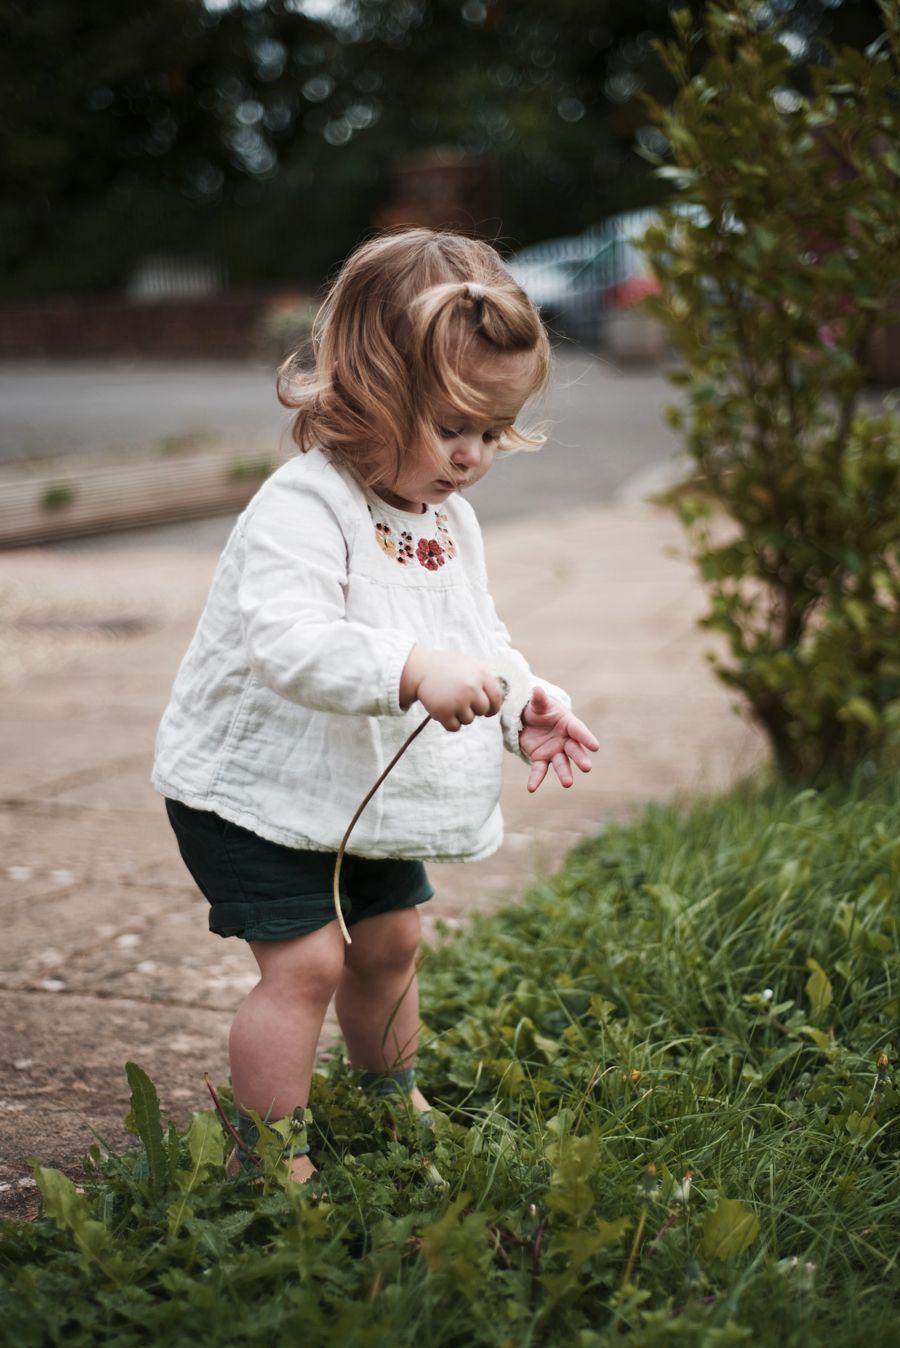 #babyphotography #babyphotos #littlegirl #littlegirlfashion #girlsfashion